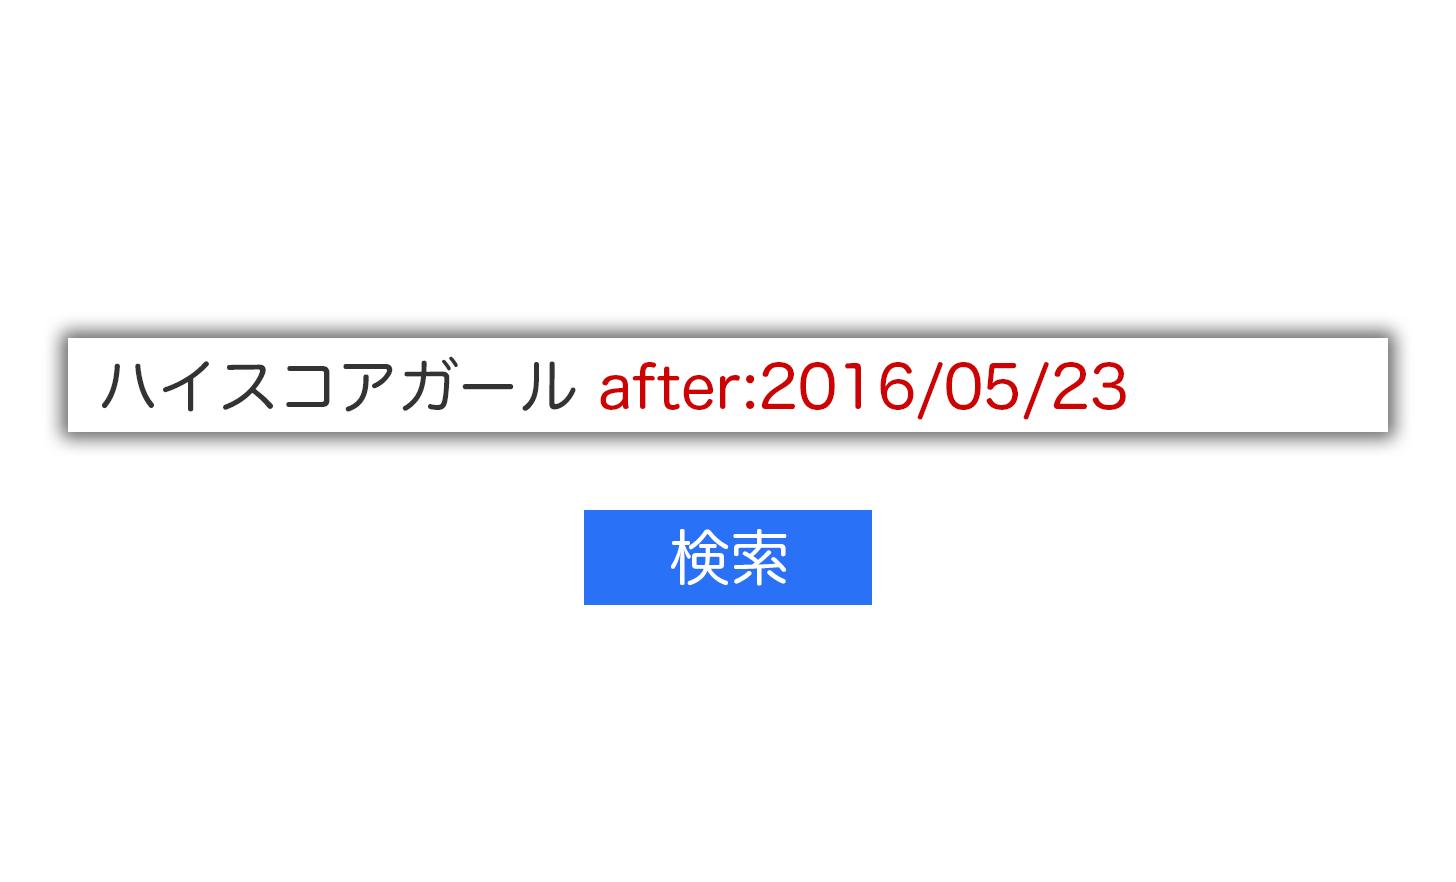 Gmailで日時指定で検索する方法。